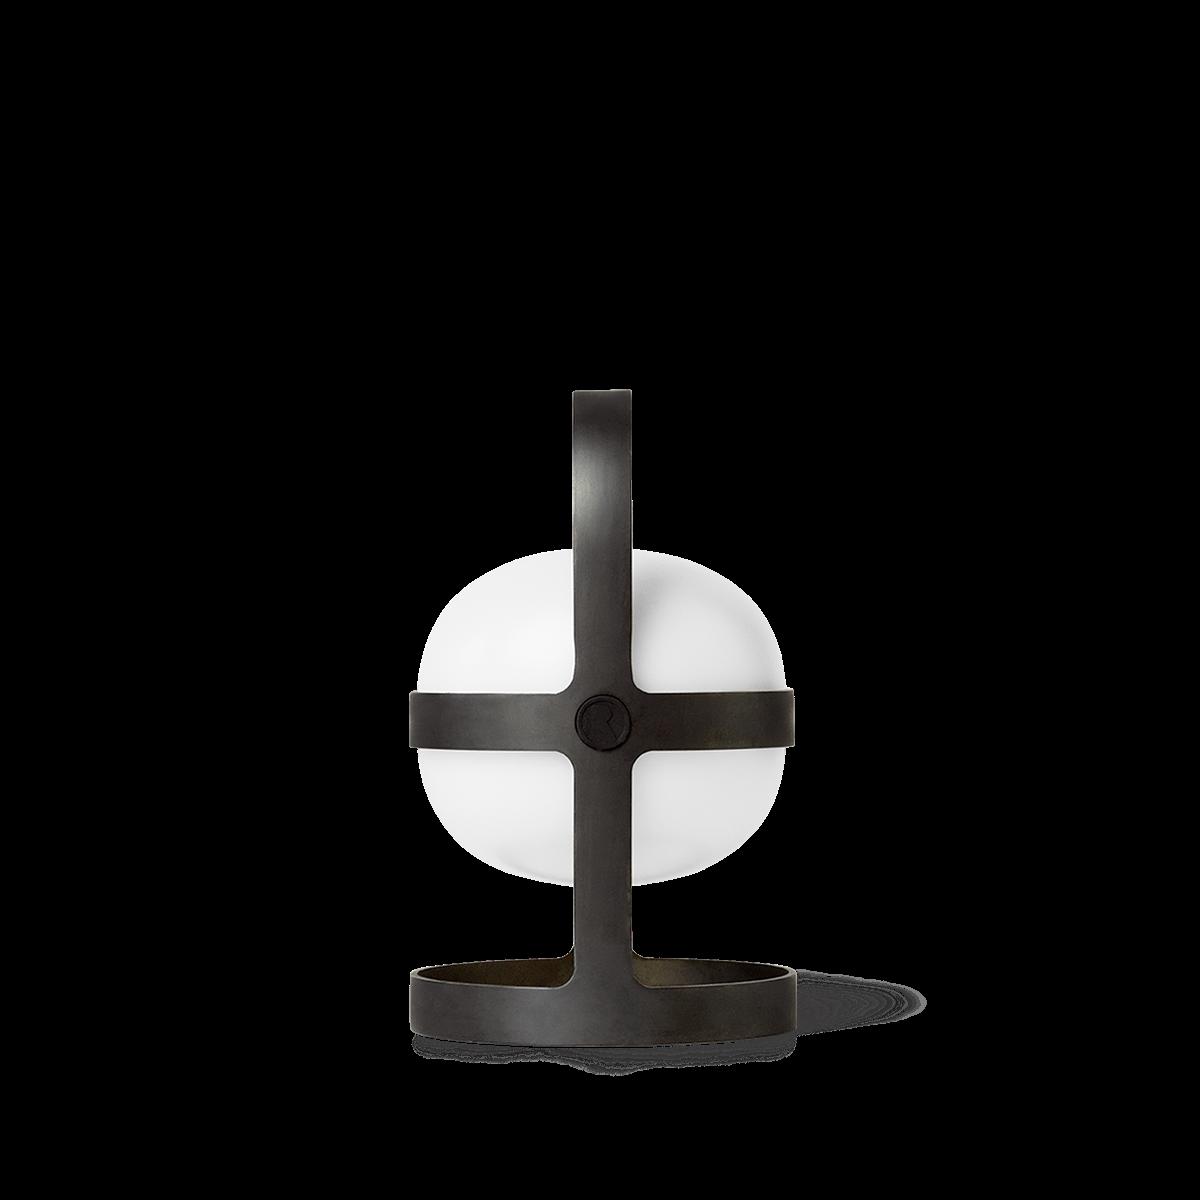 Rosendahl - Soft Spot Solar Lantern Small - Black (26300)